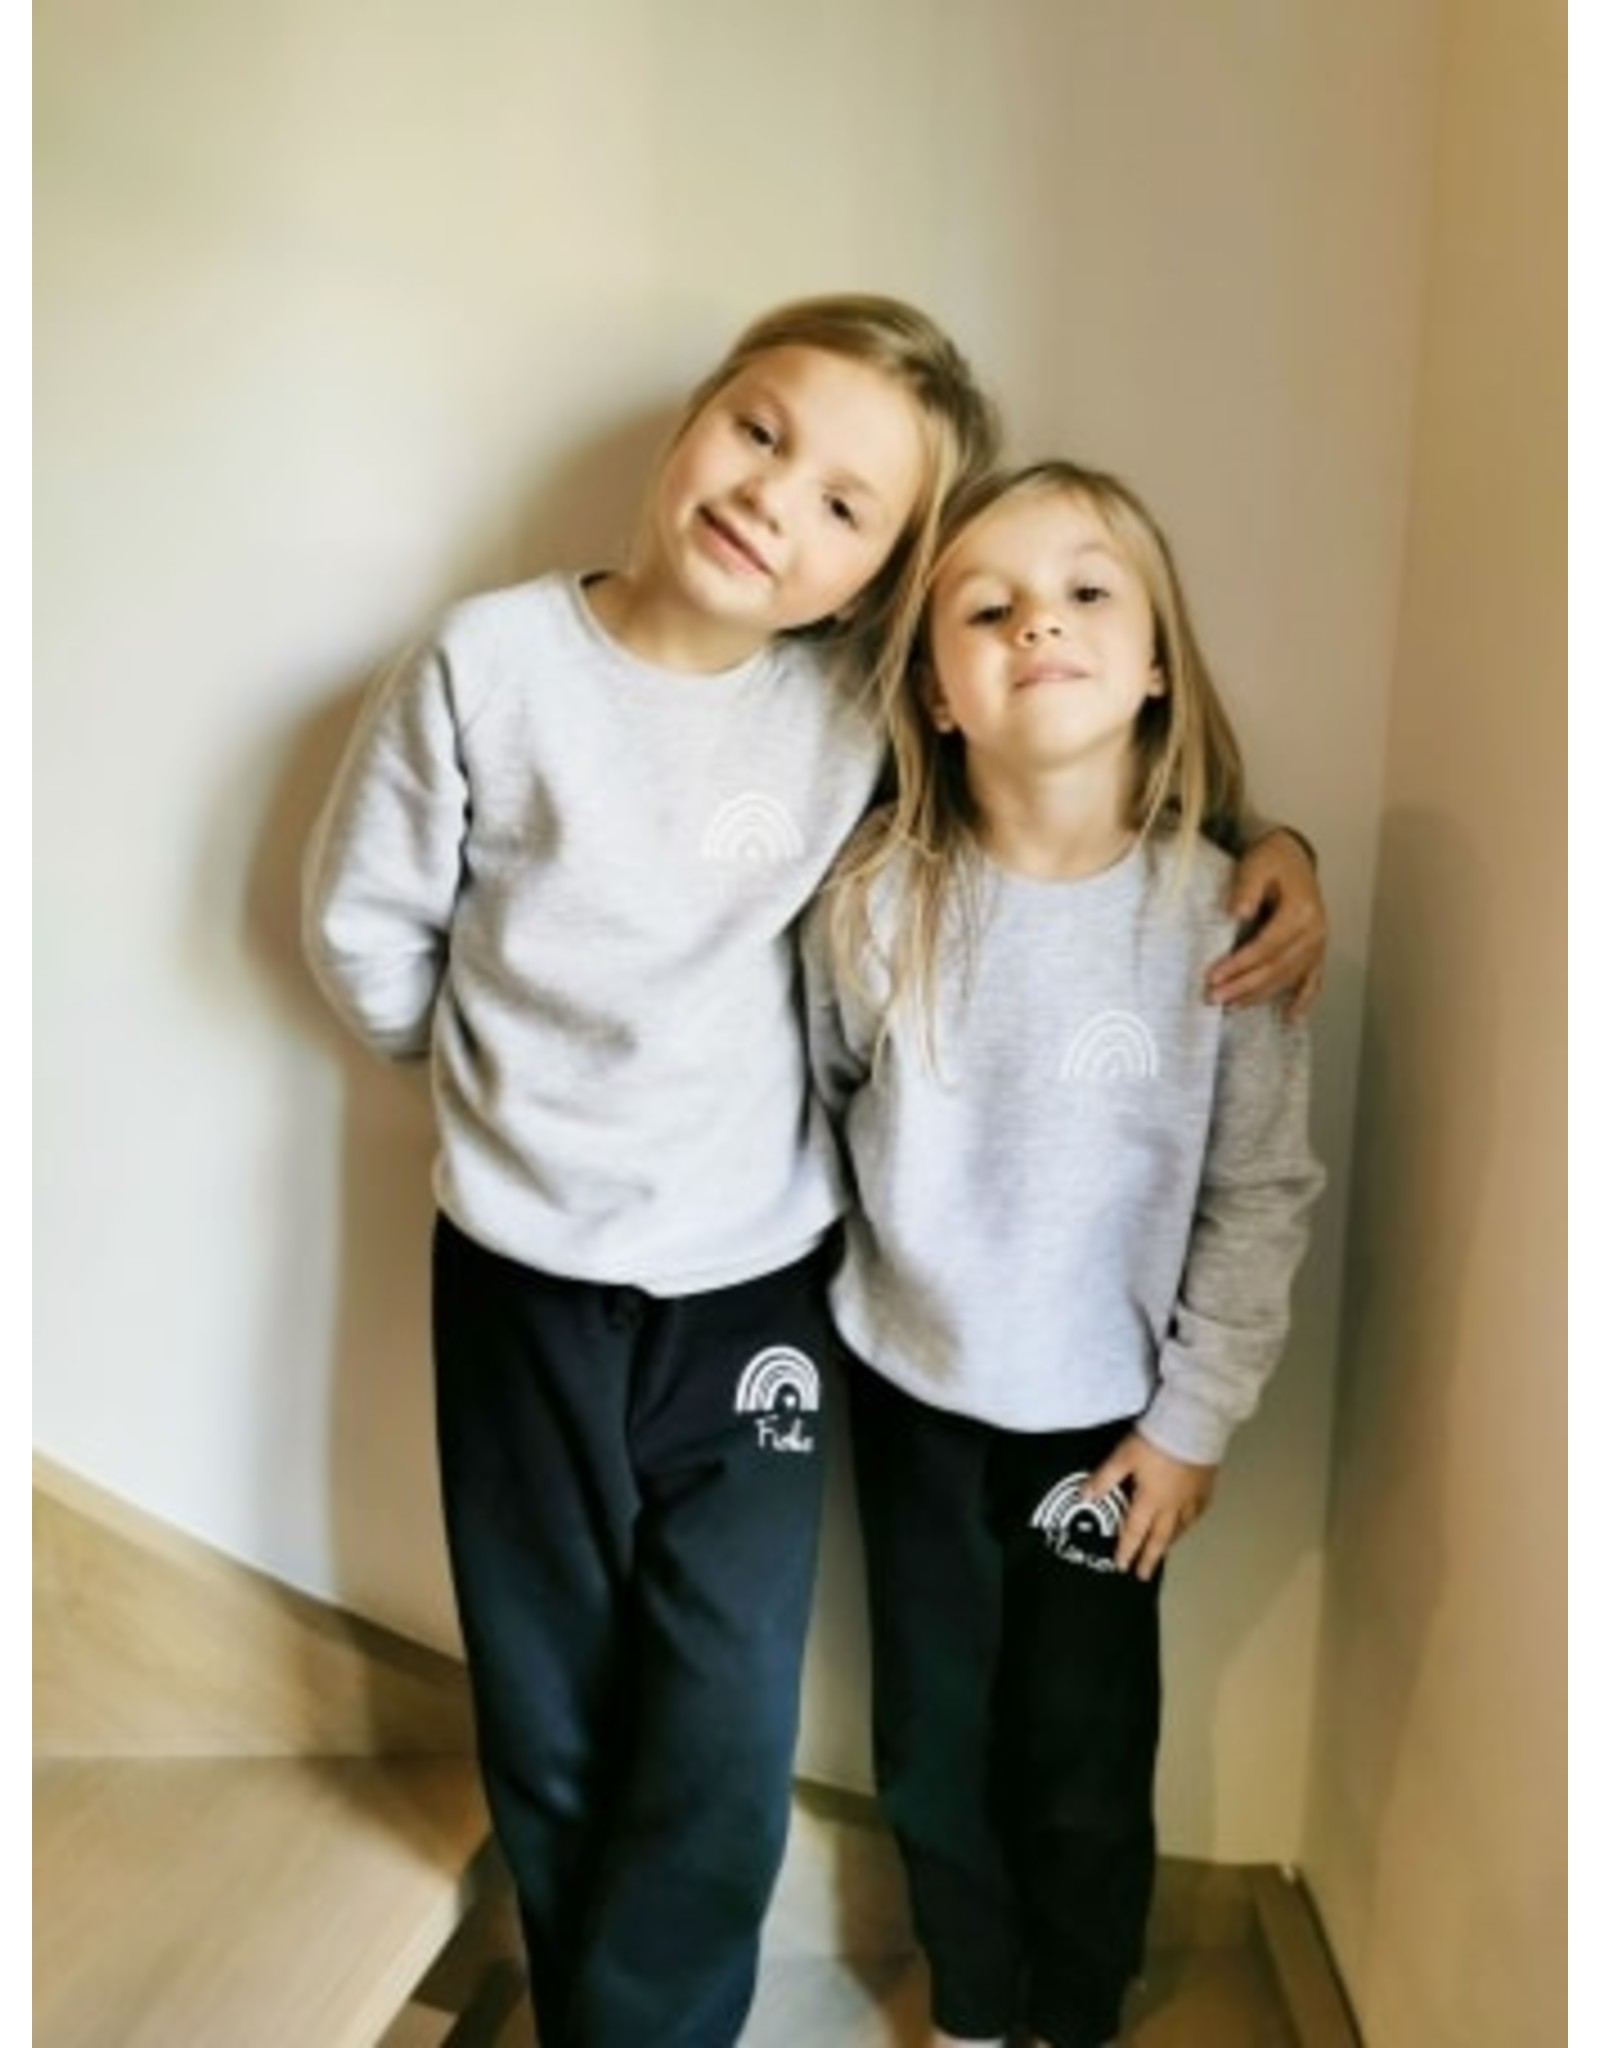 Twinning sweater kind